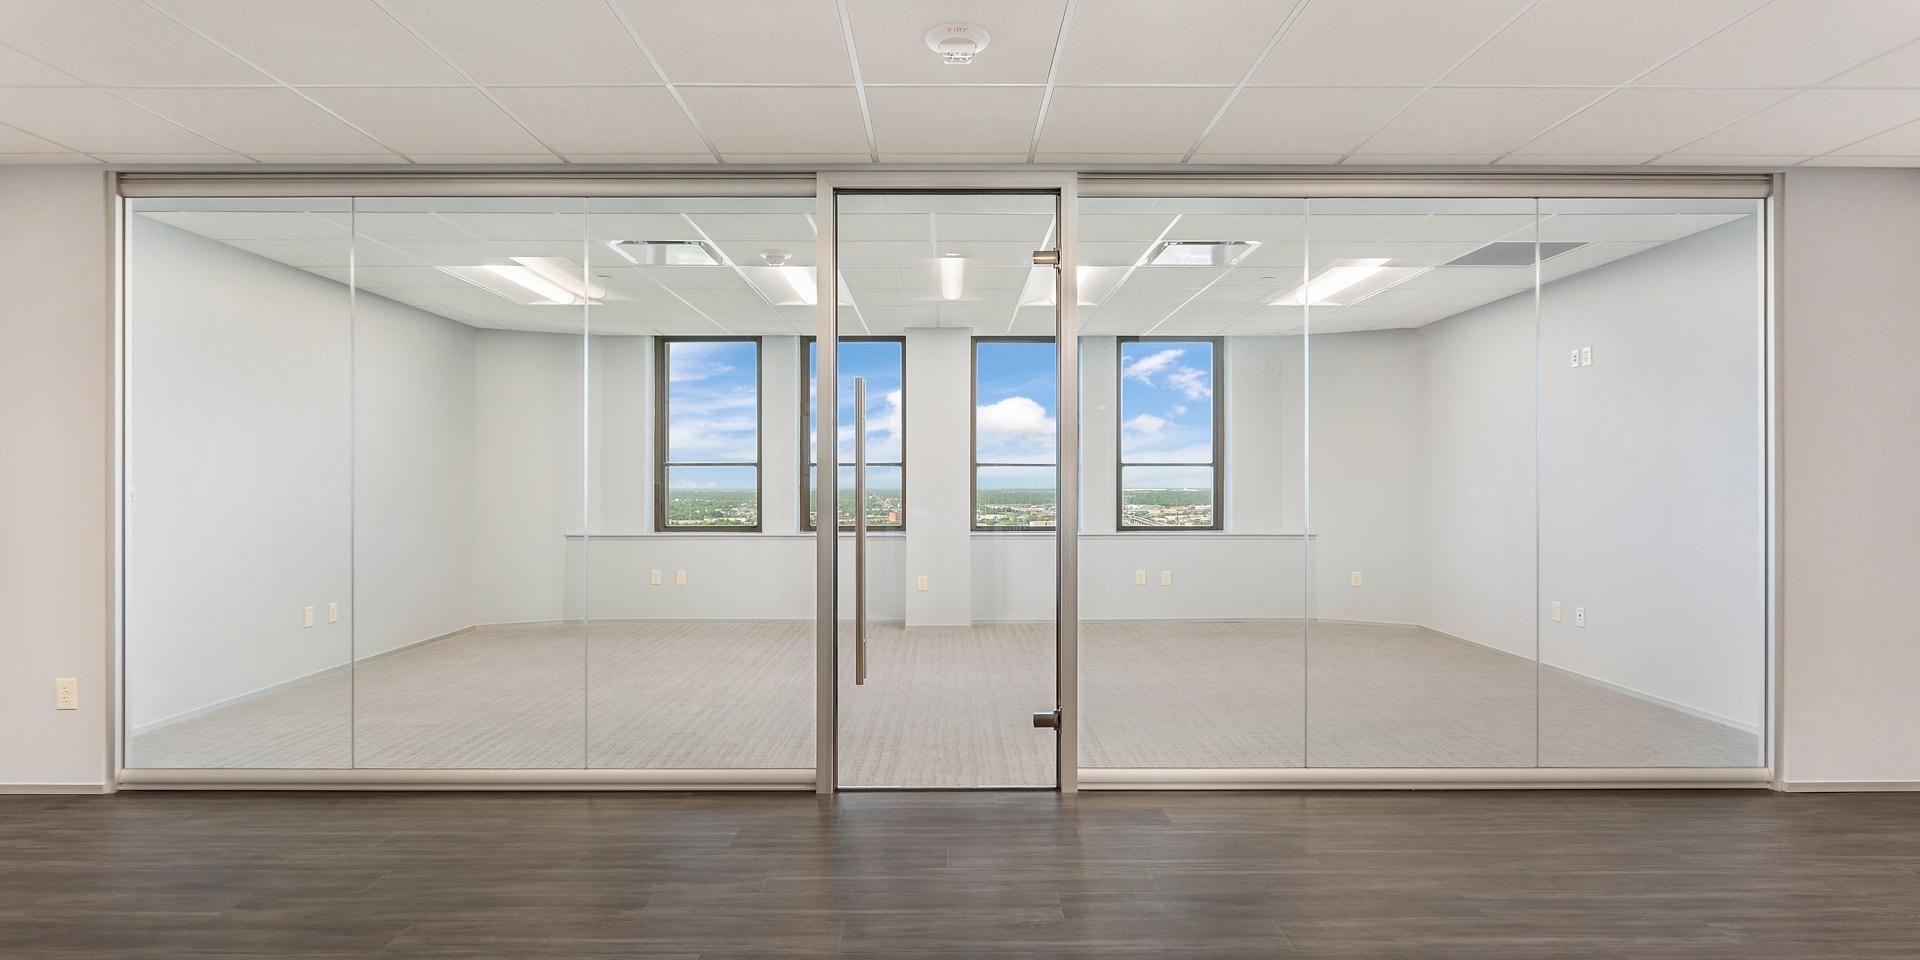 NxtWall View Series Architectural Glass Walls - www.nxtwall.com